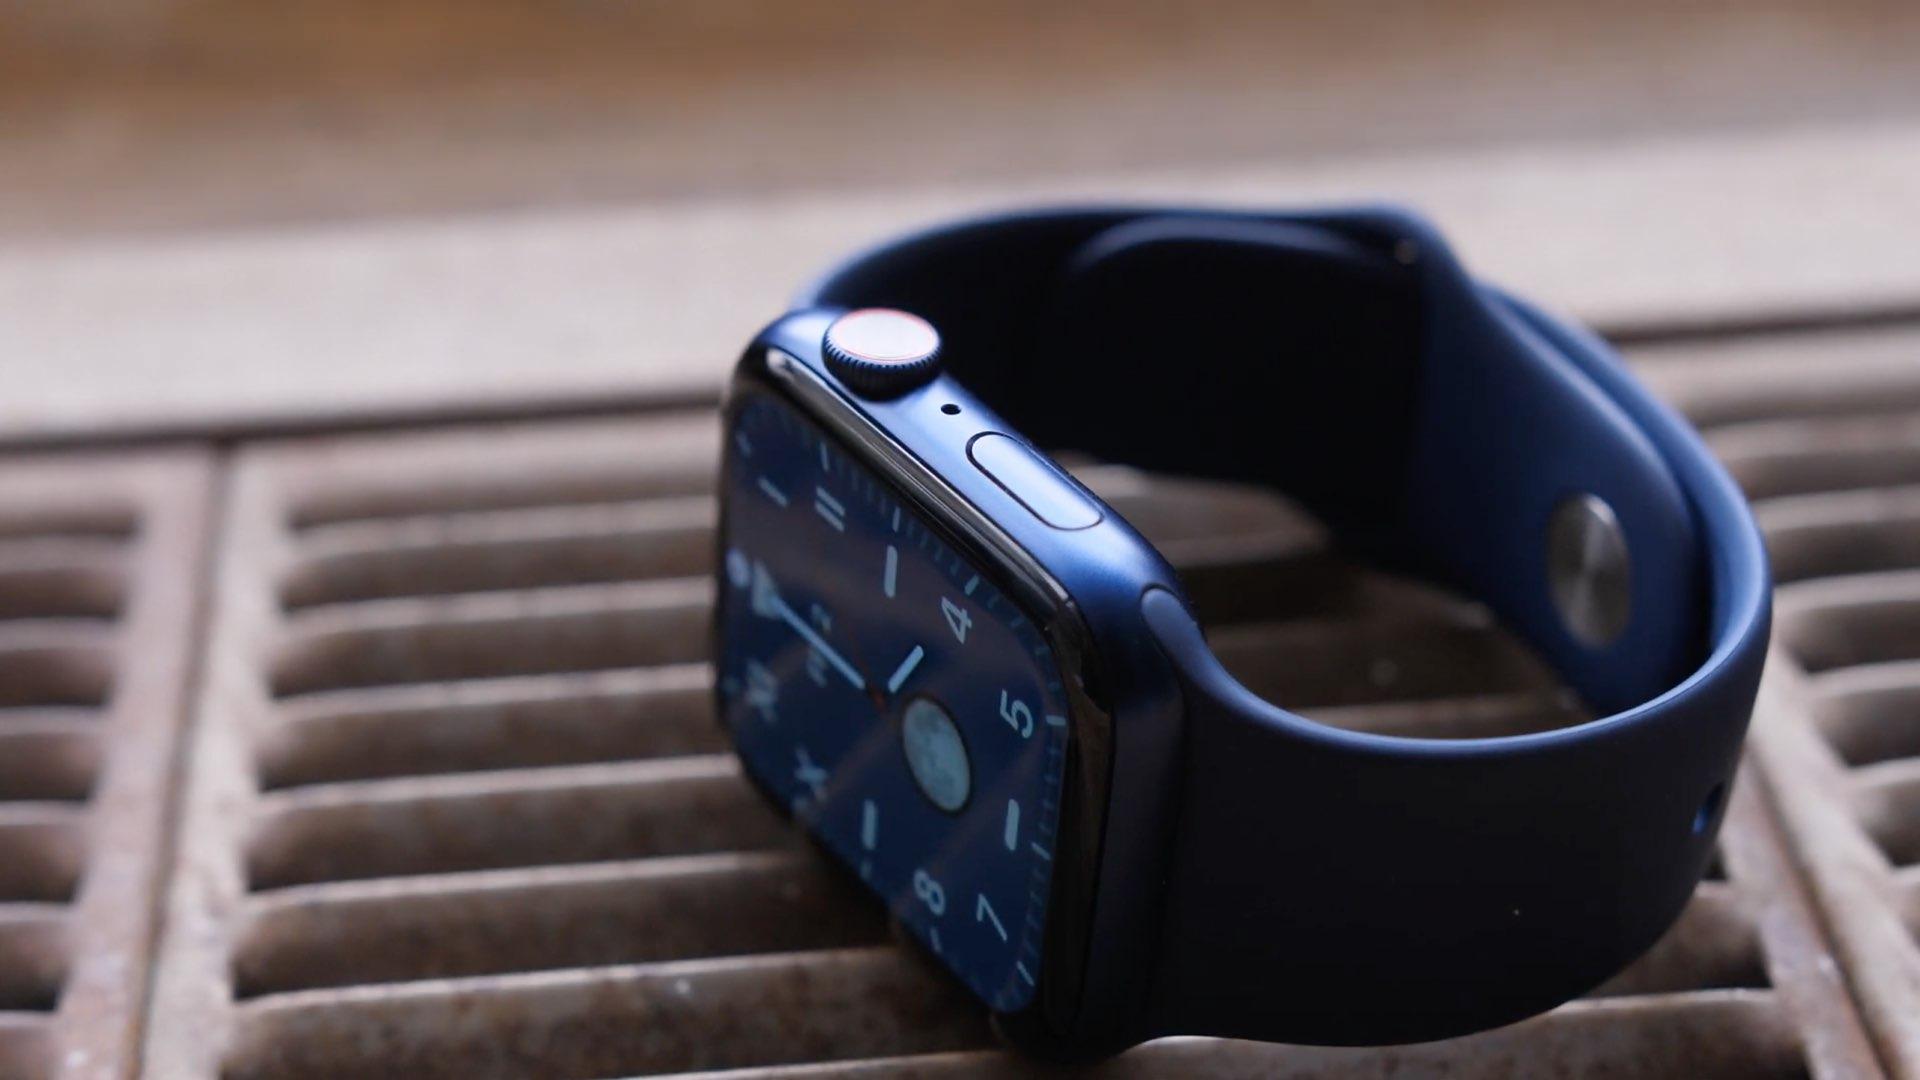 Apple Watch Series 6 photo